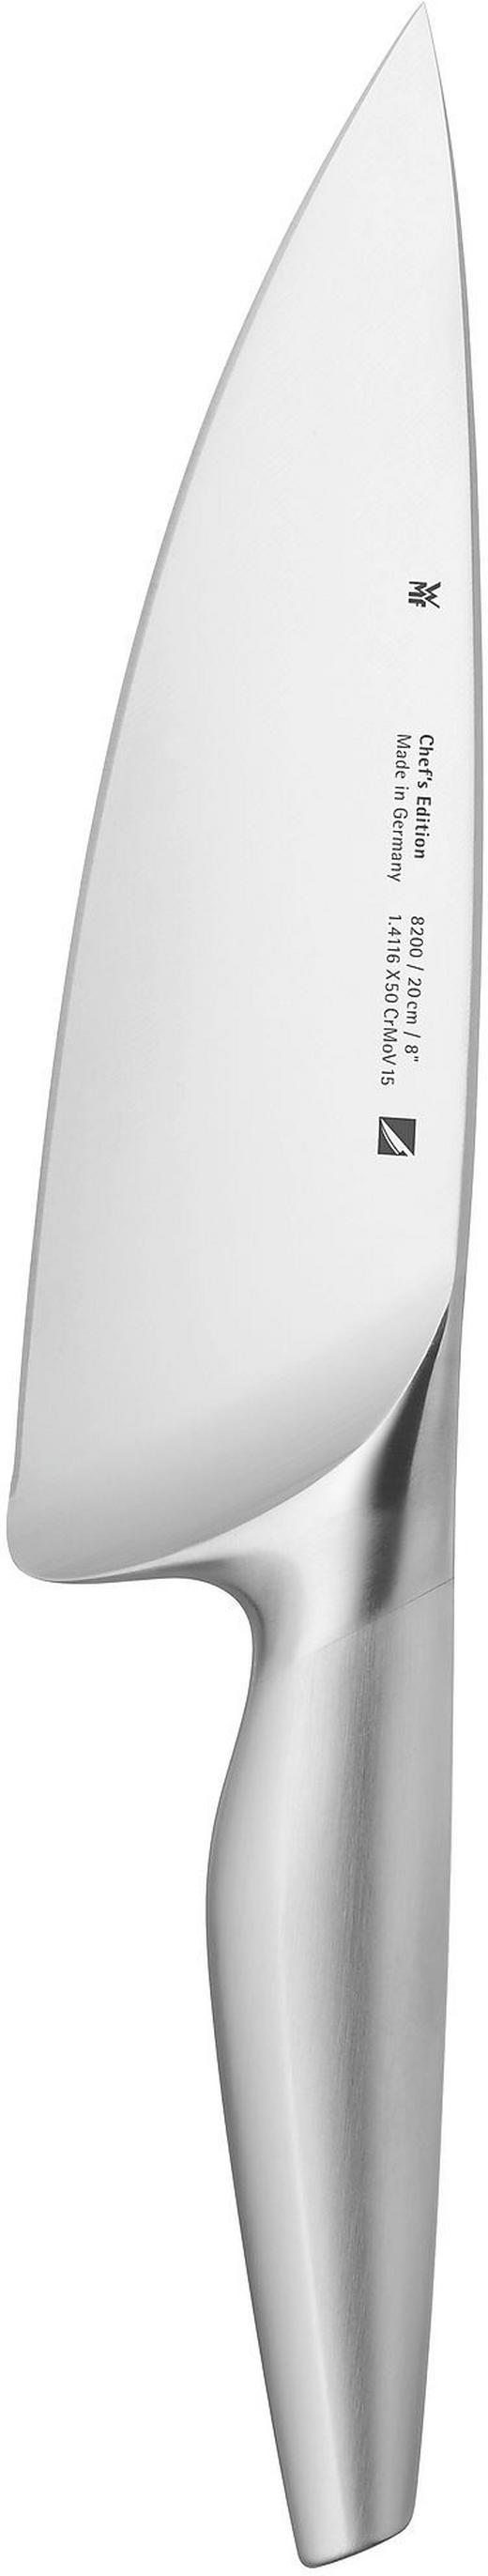 KOCHMESSER  Edelstahl  32 cm - Edelstahlfarben, Basics, Metall (32cm) - WMF